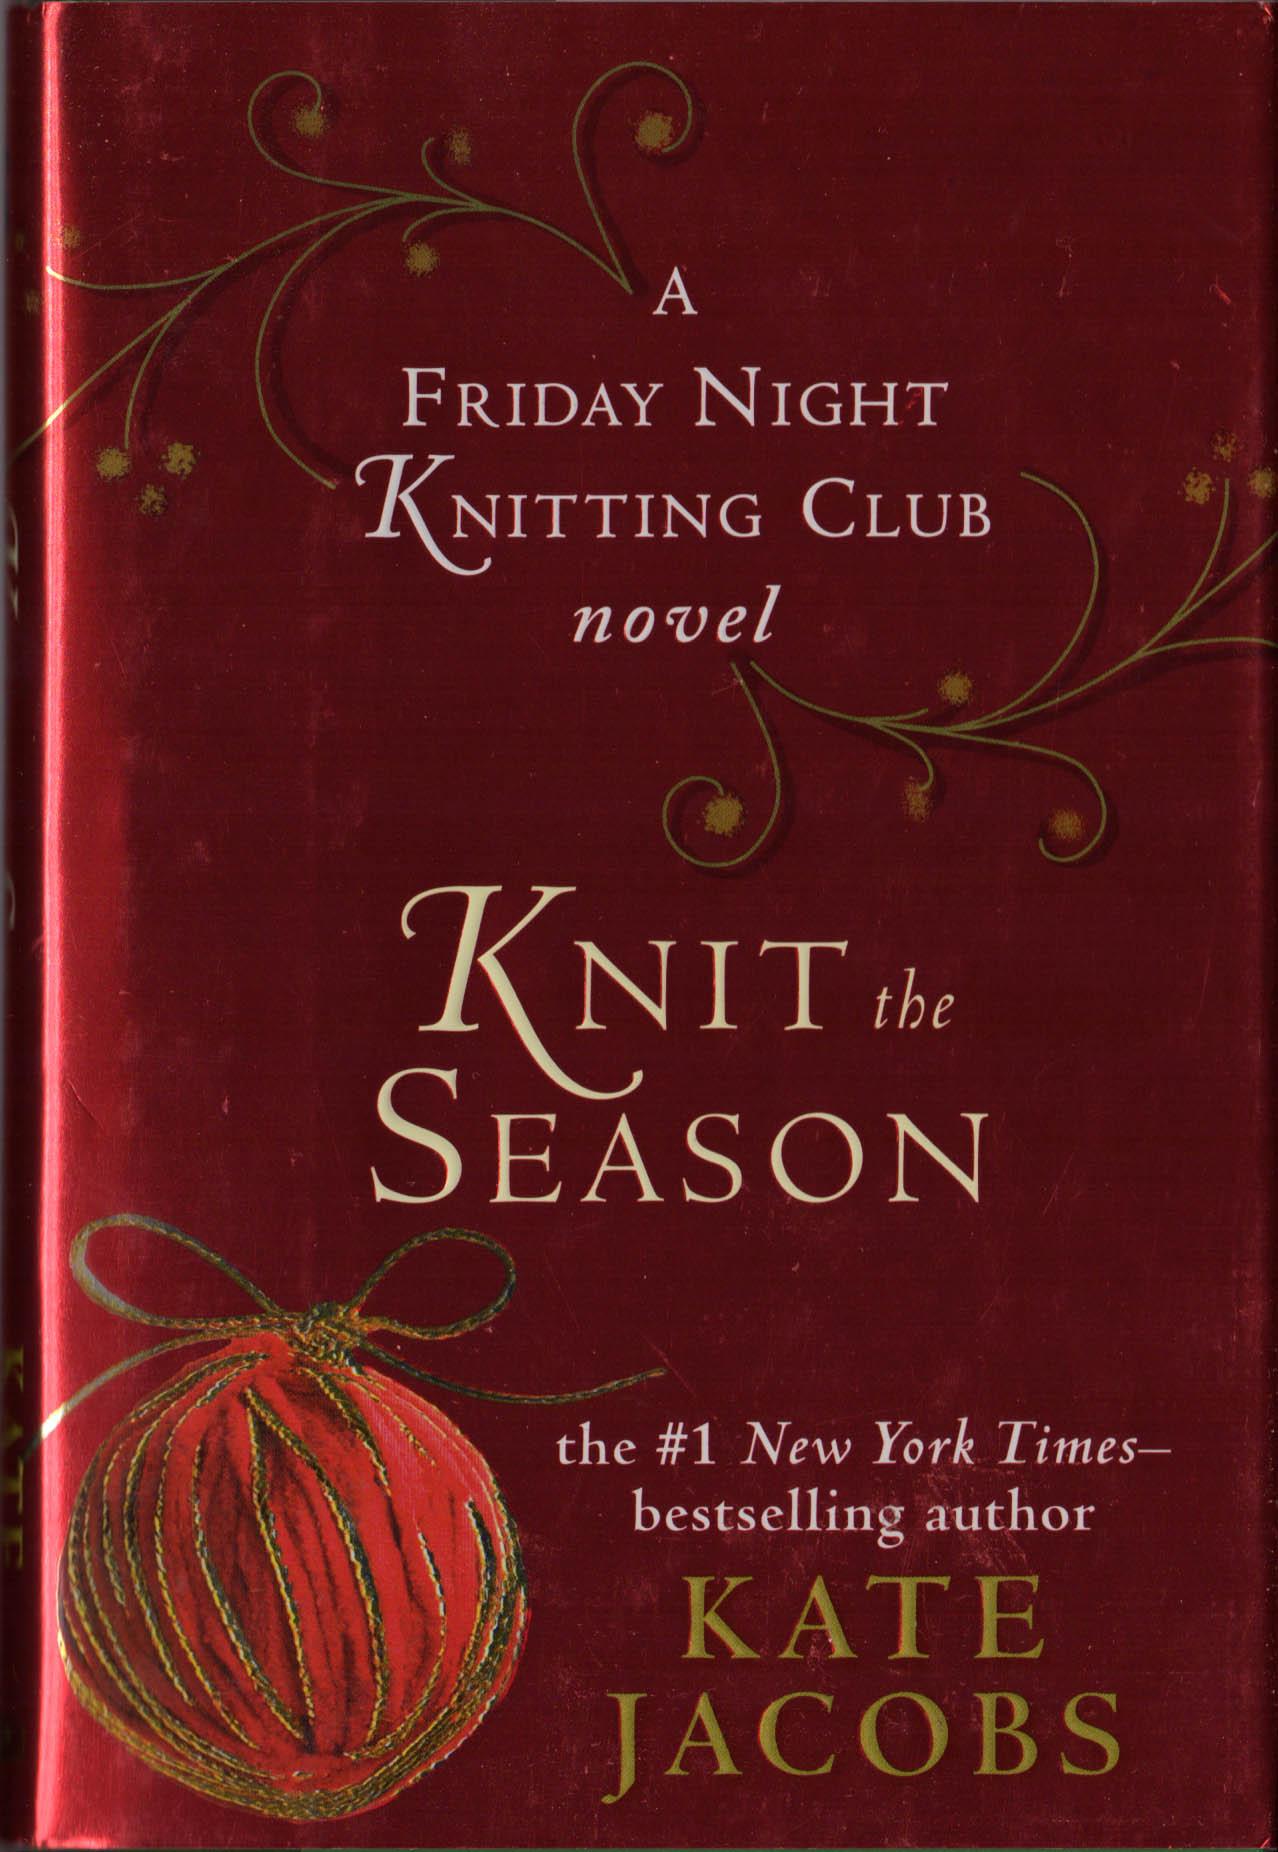 Friday Night Knitting Club : Friday night knitting club knit the season kate jacobs